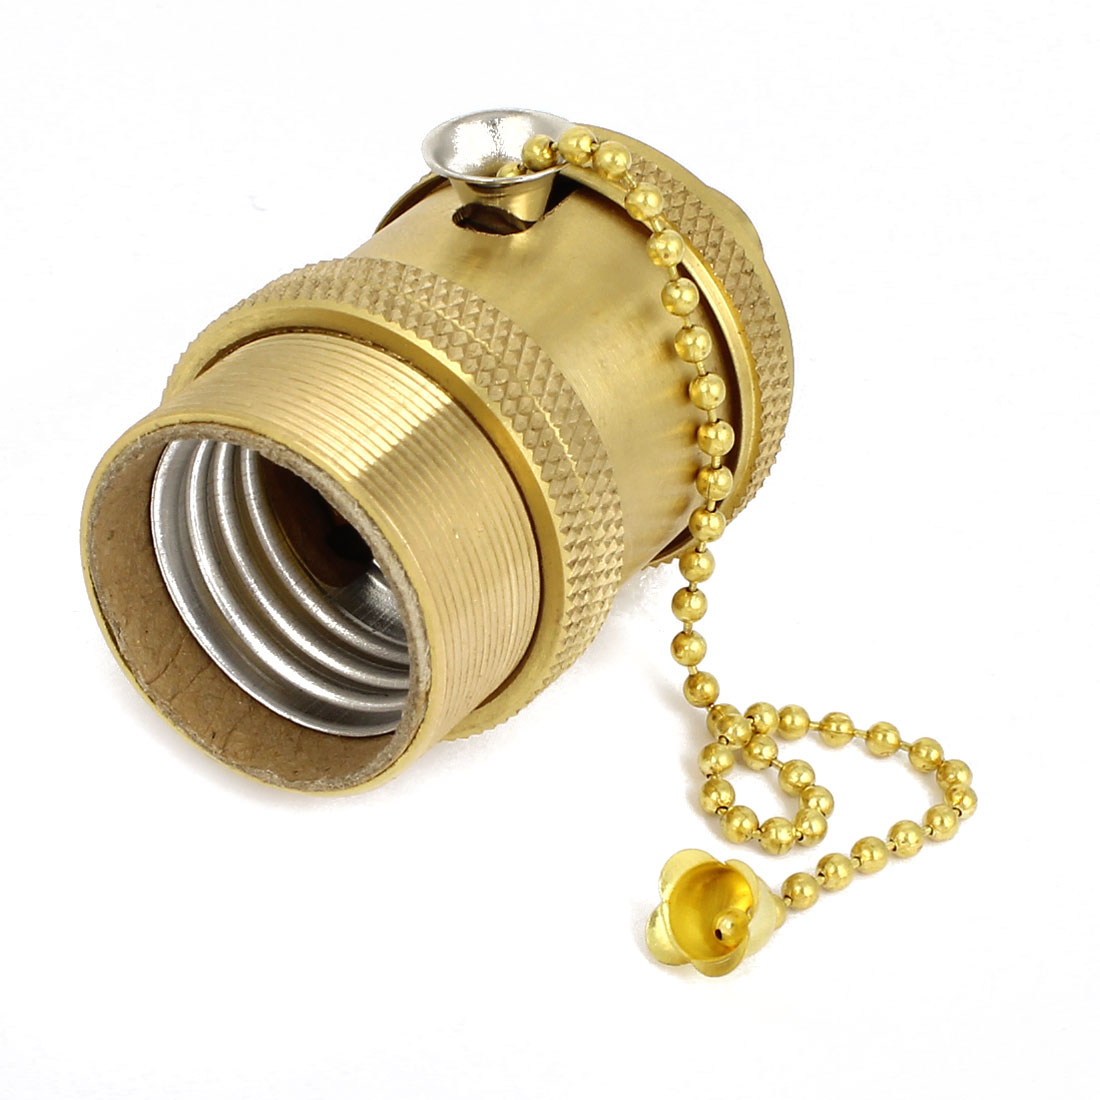 Gold Tone Brass E27 Bar DIY Droplight Bulb Base Holder AC 250V 250W